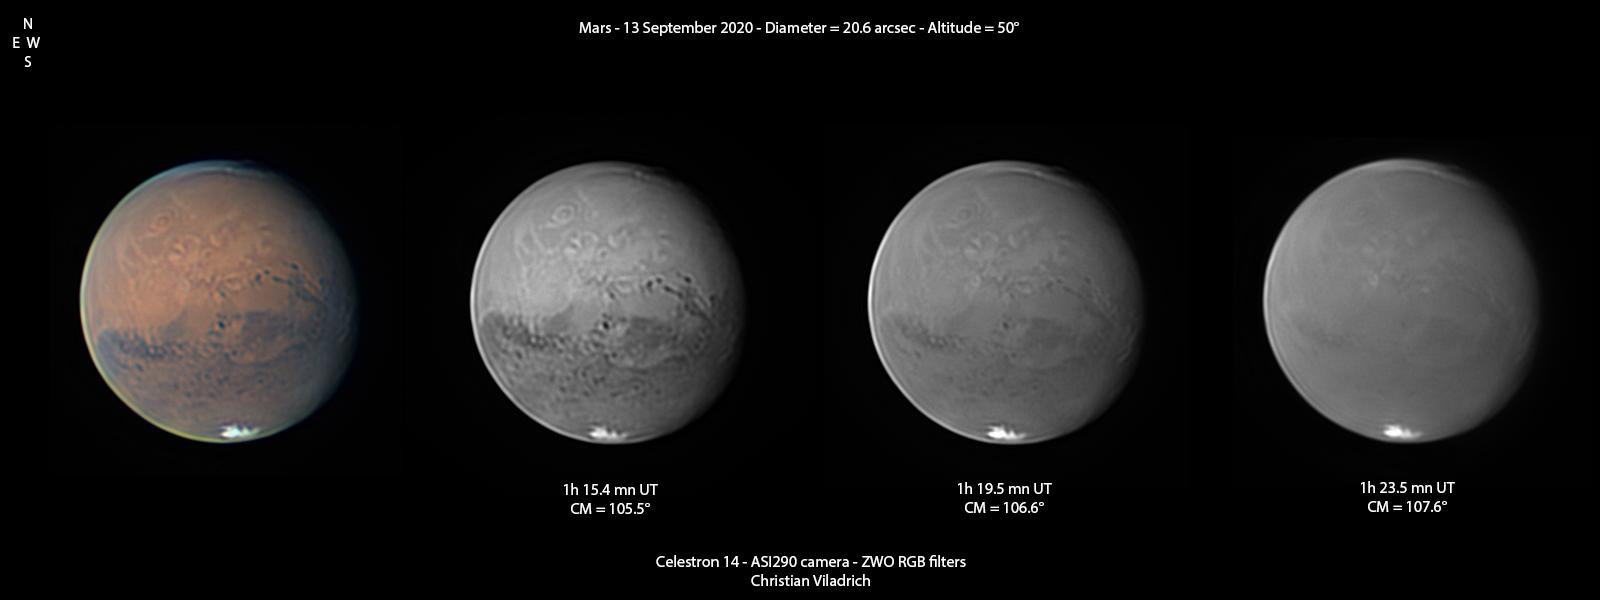 Mars-13september2020-C14-ASI290-RGB.jpg